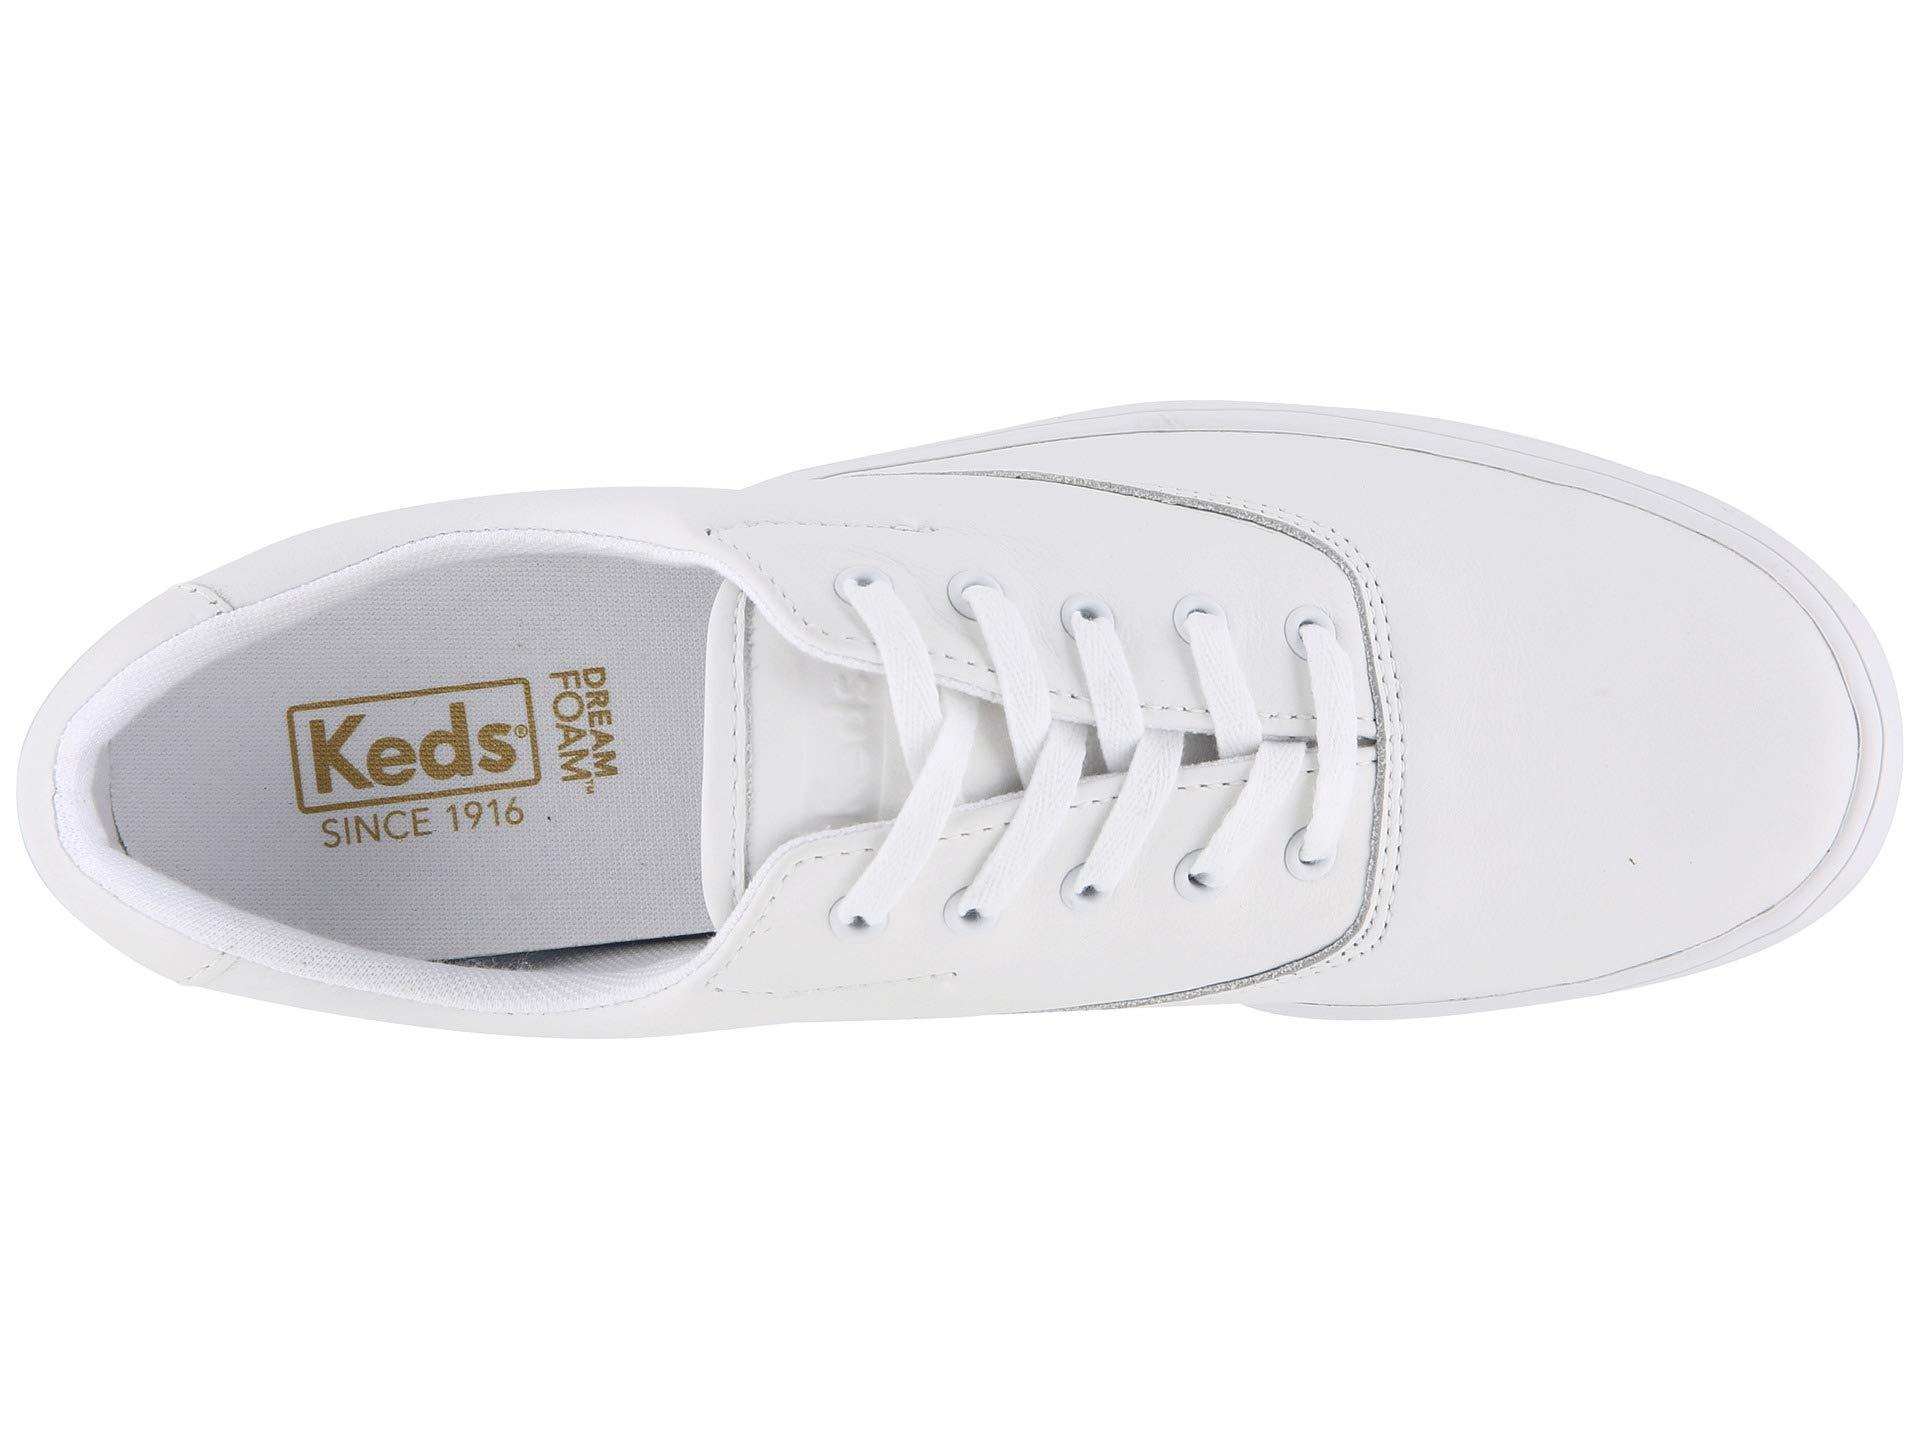 keds rise leather